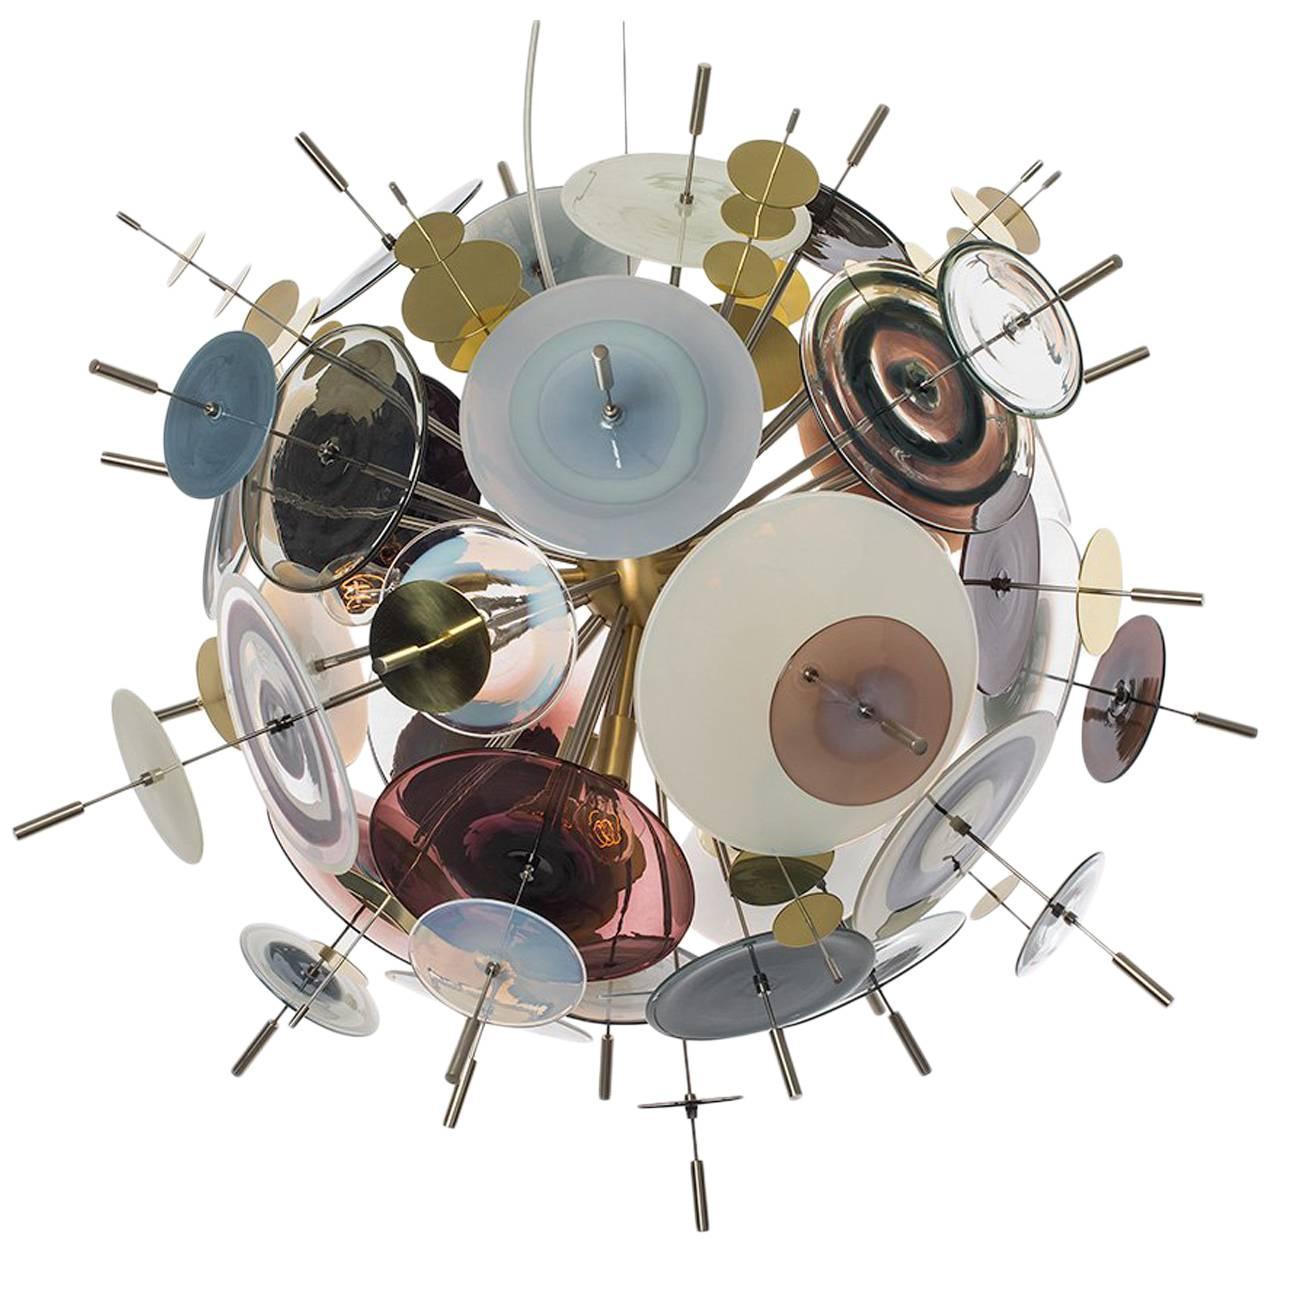 Confetti Glass Topaz and Ivory Chandelier by Avram Rusu Studio